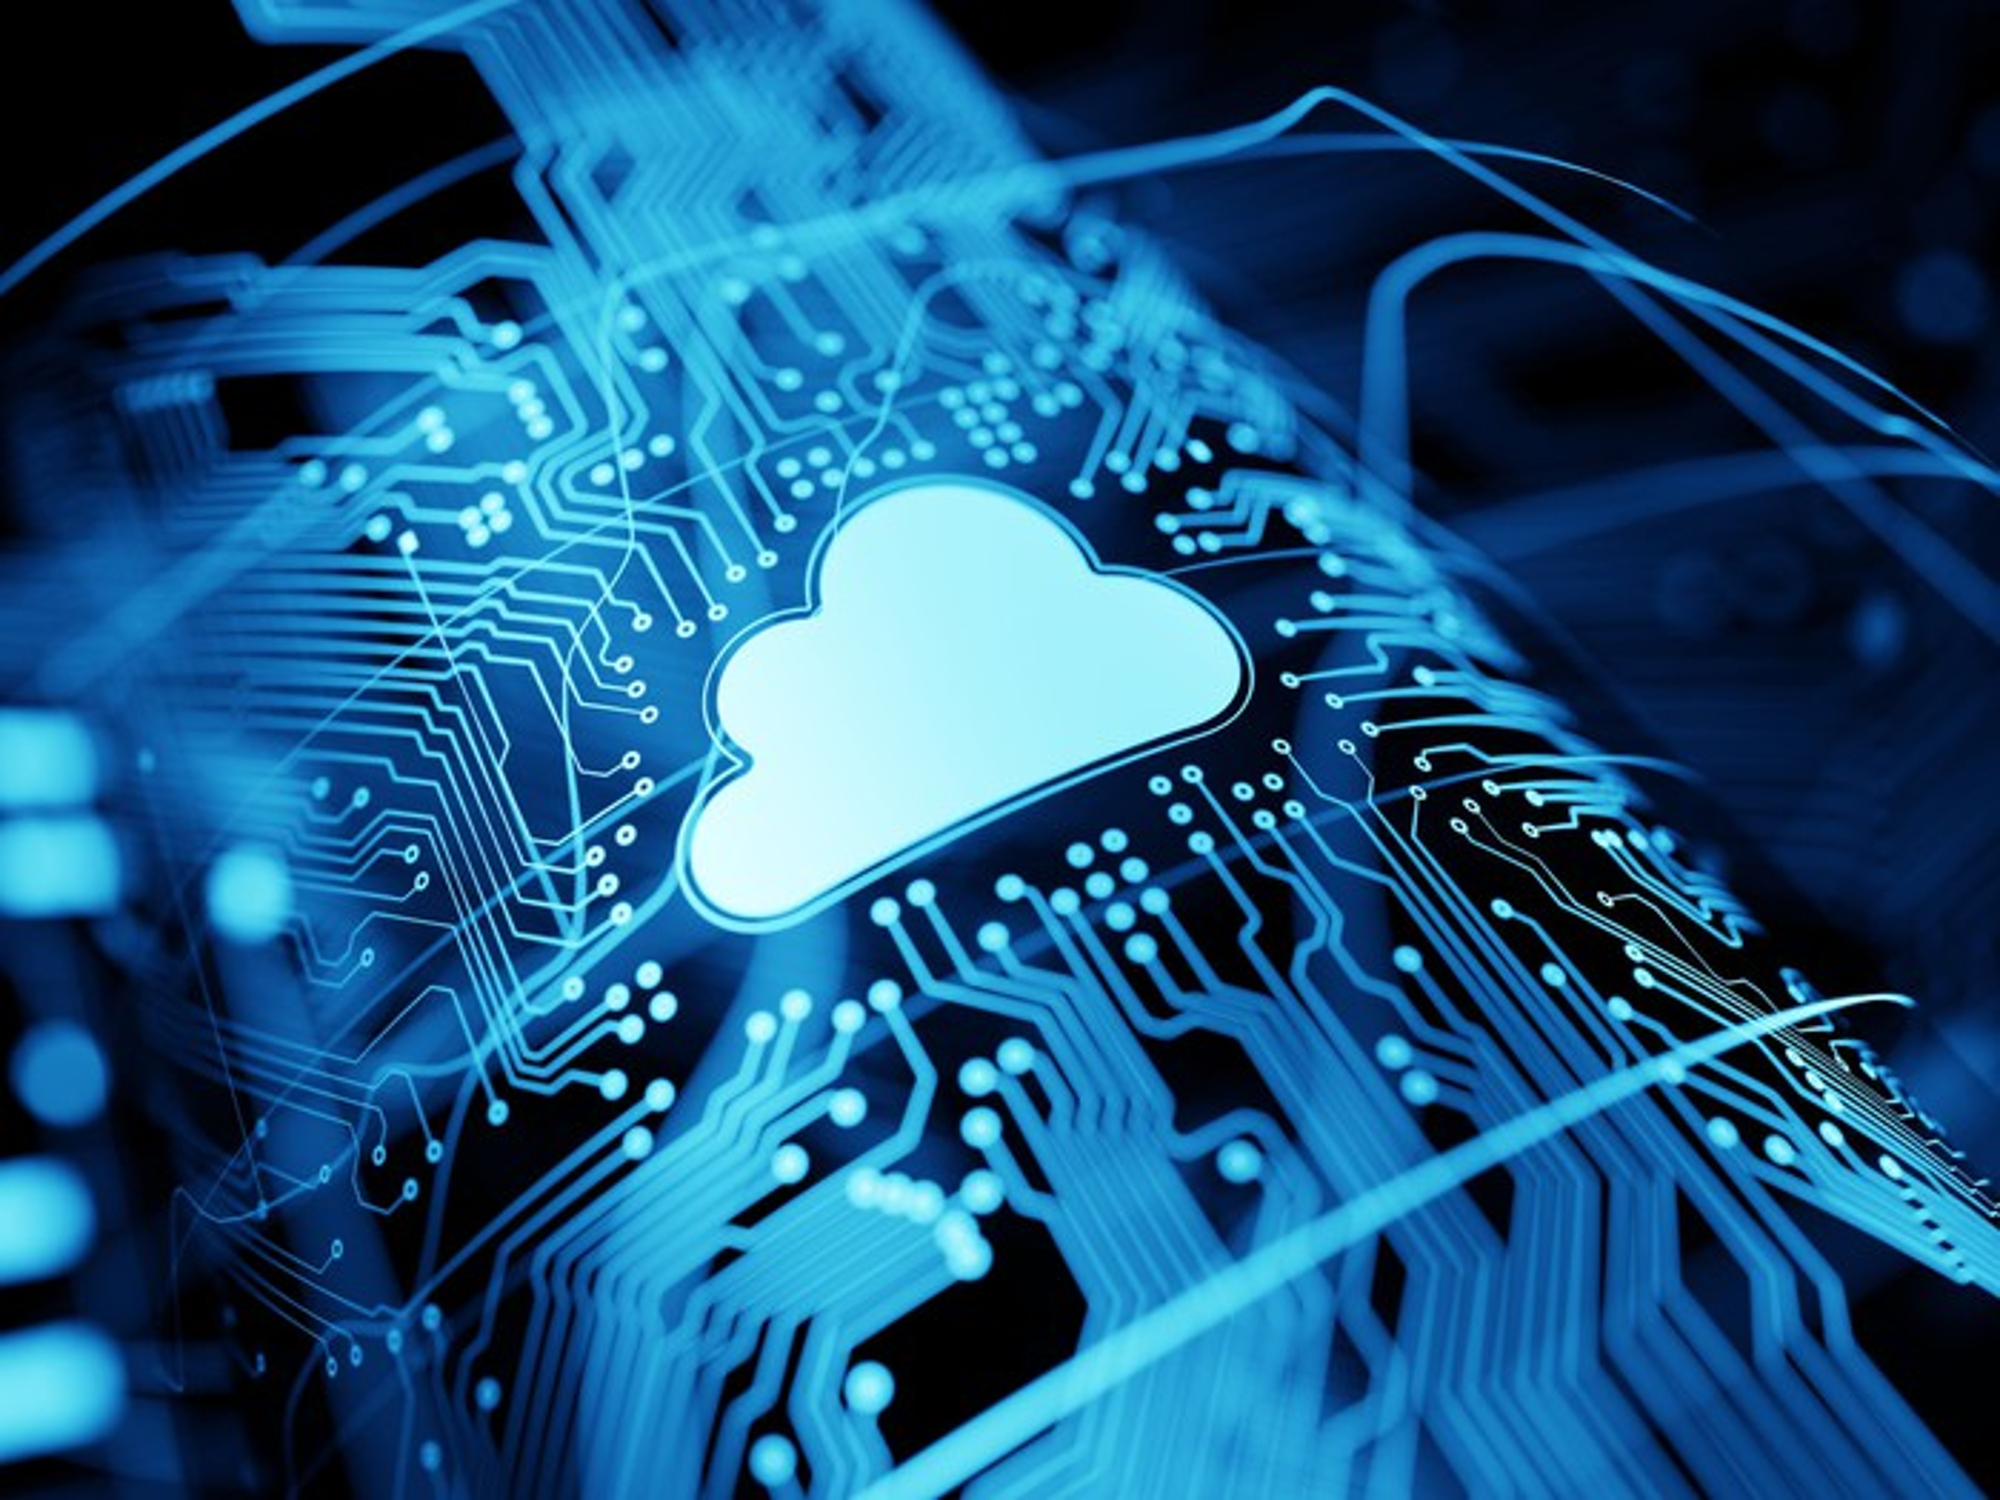 A cloud on a virtual circuit board.